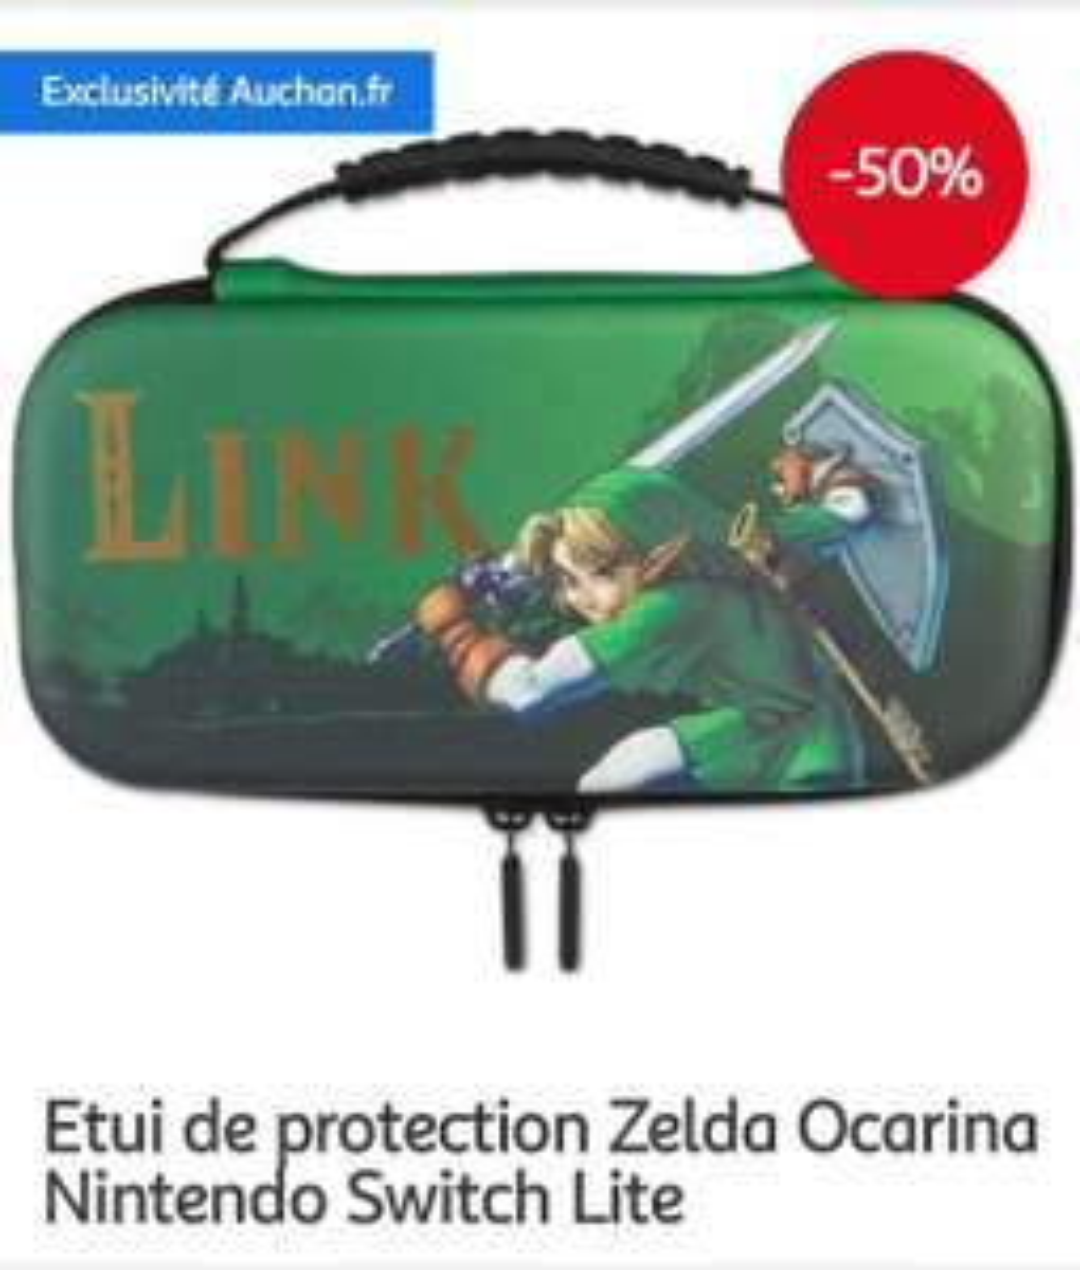 Etui de protection Zelda Ocarina Nintendo Switch Lite